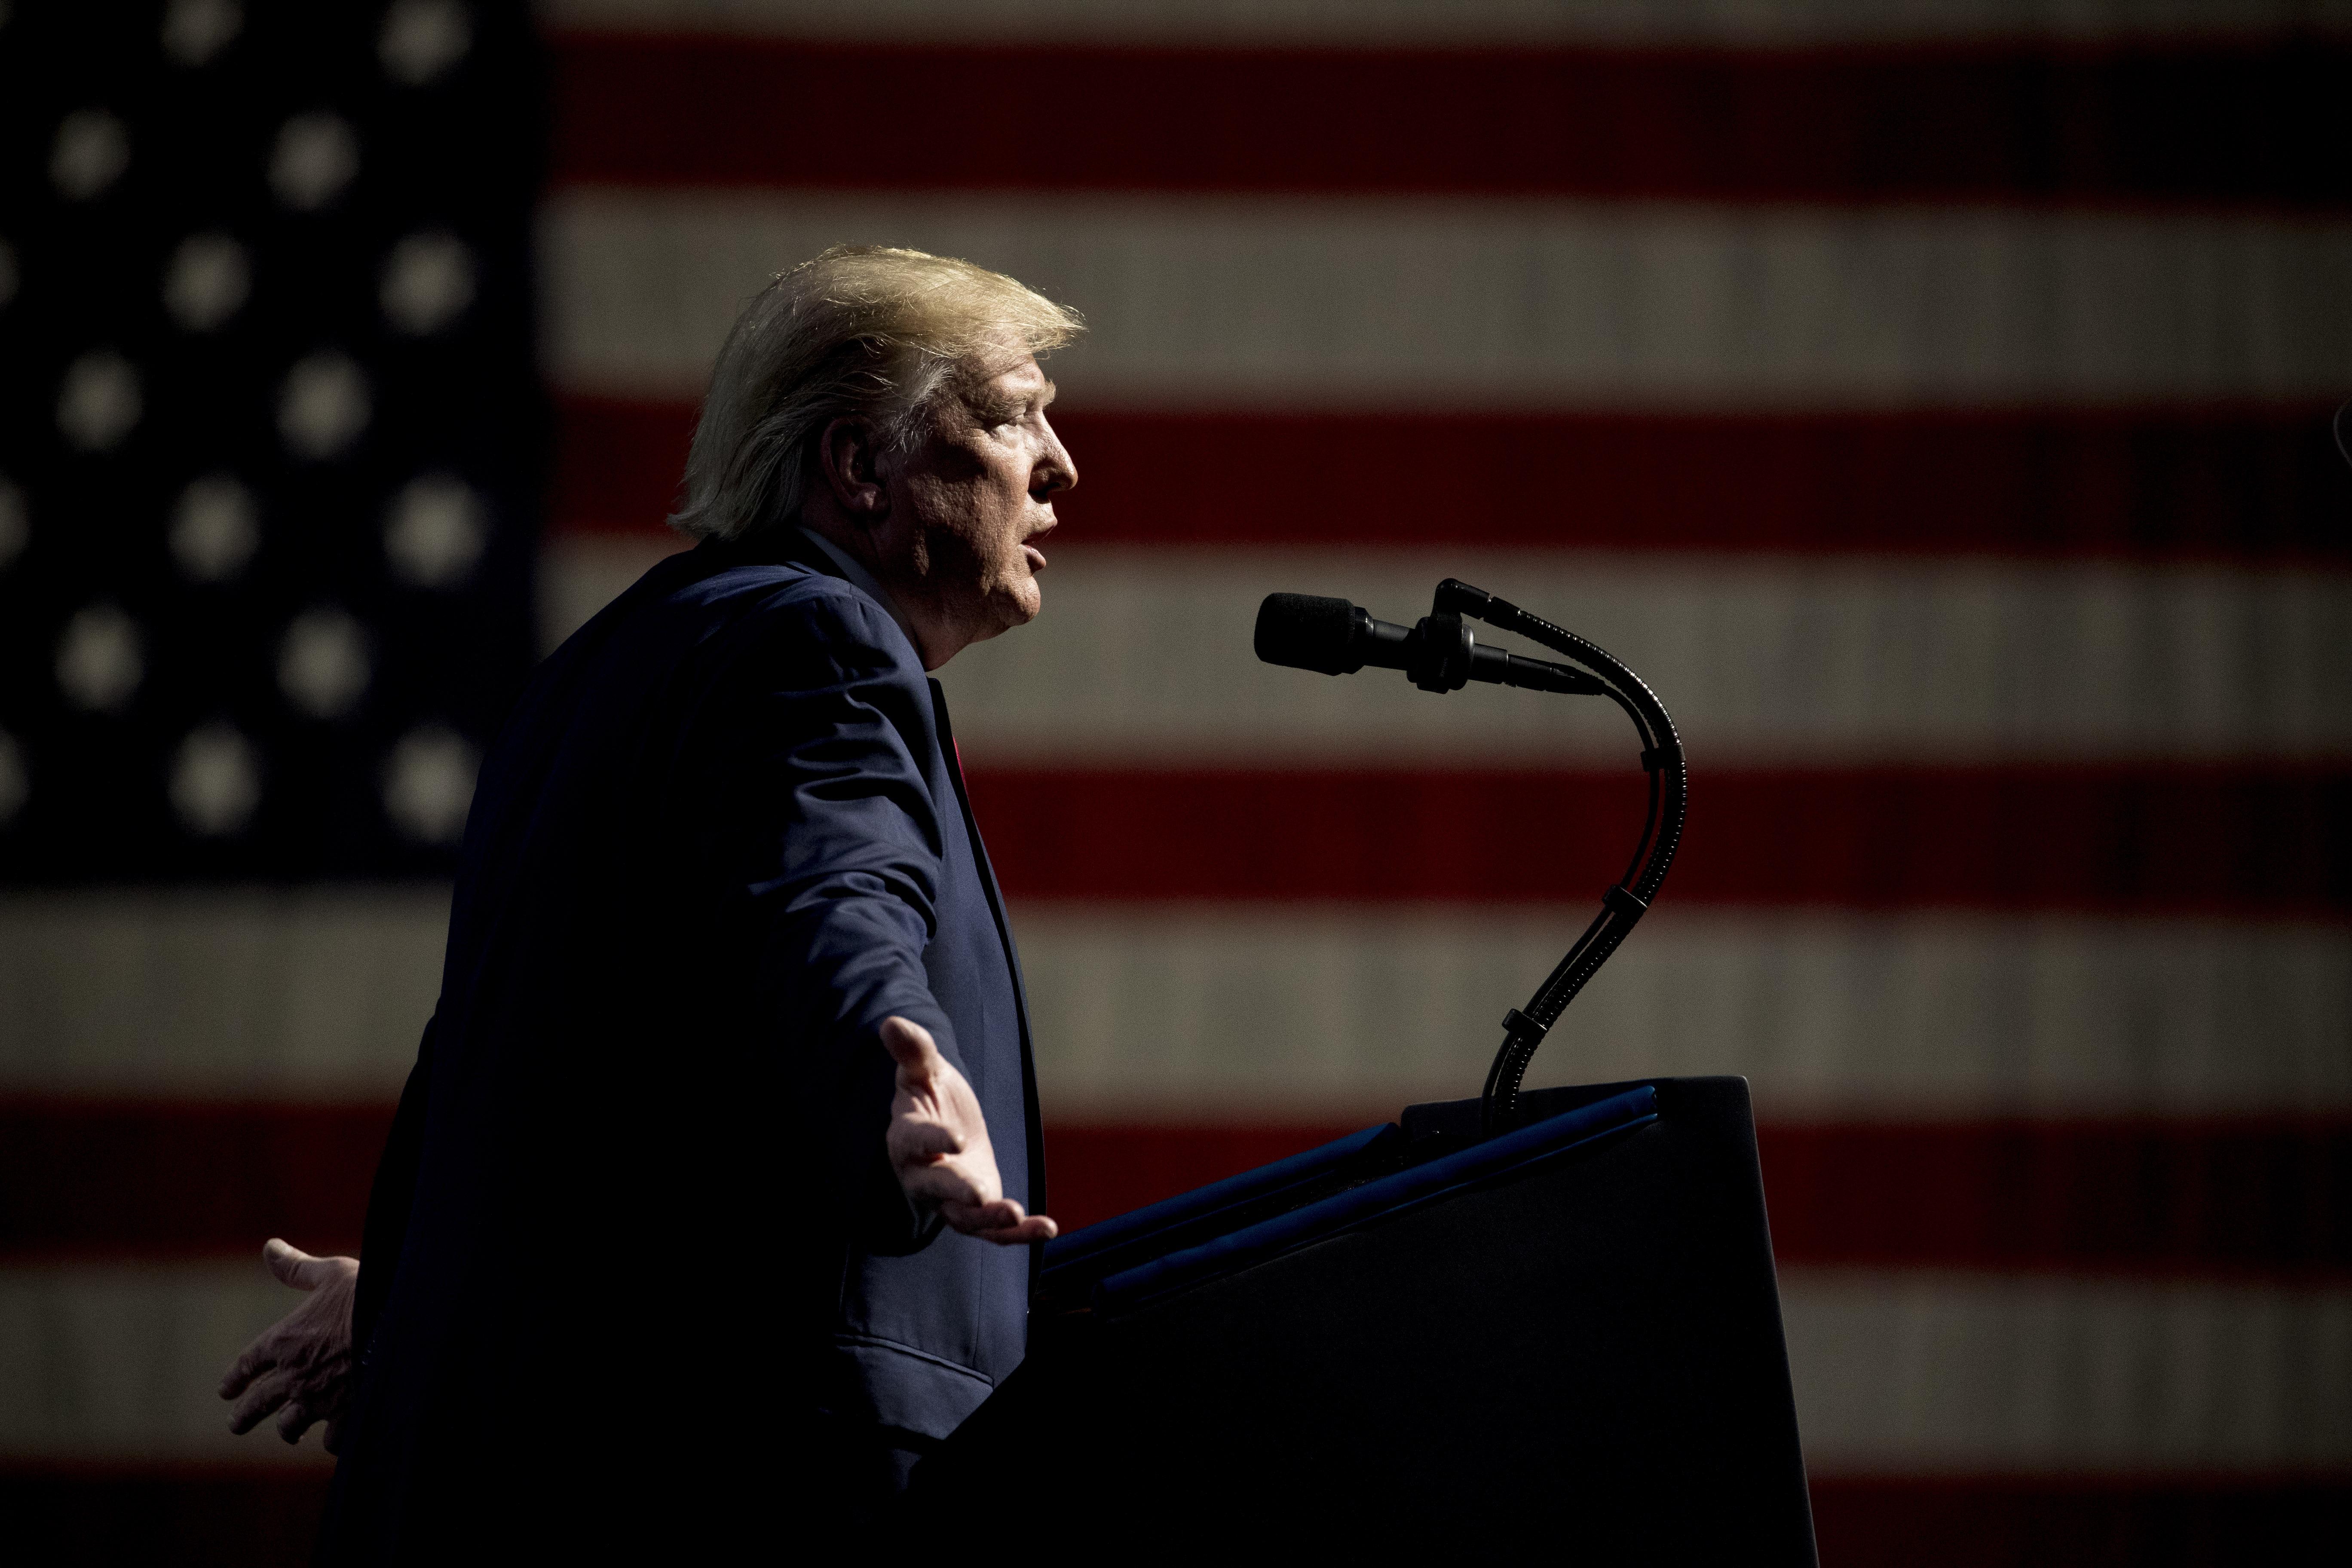 Trump slams unfair Pelosi delay, rallies conservatives